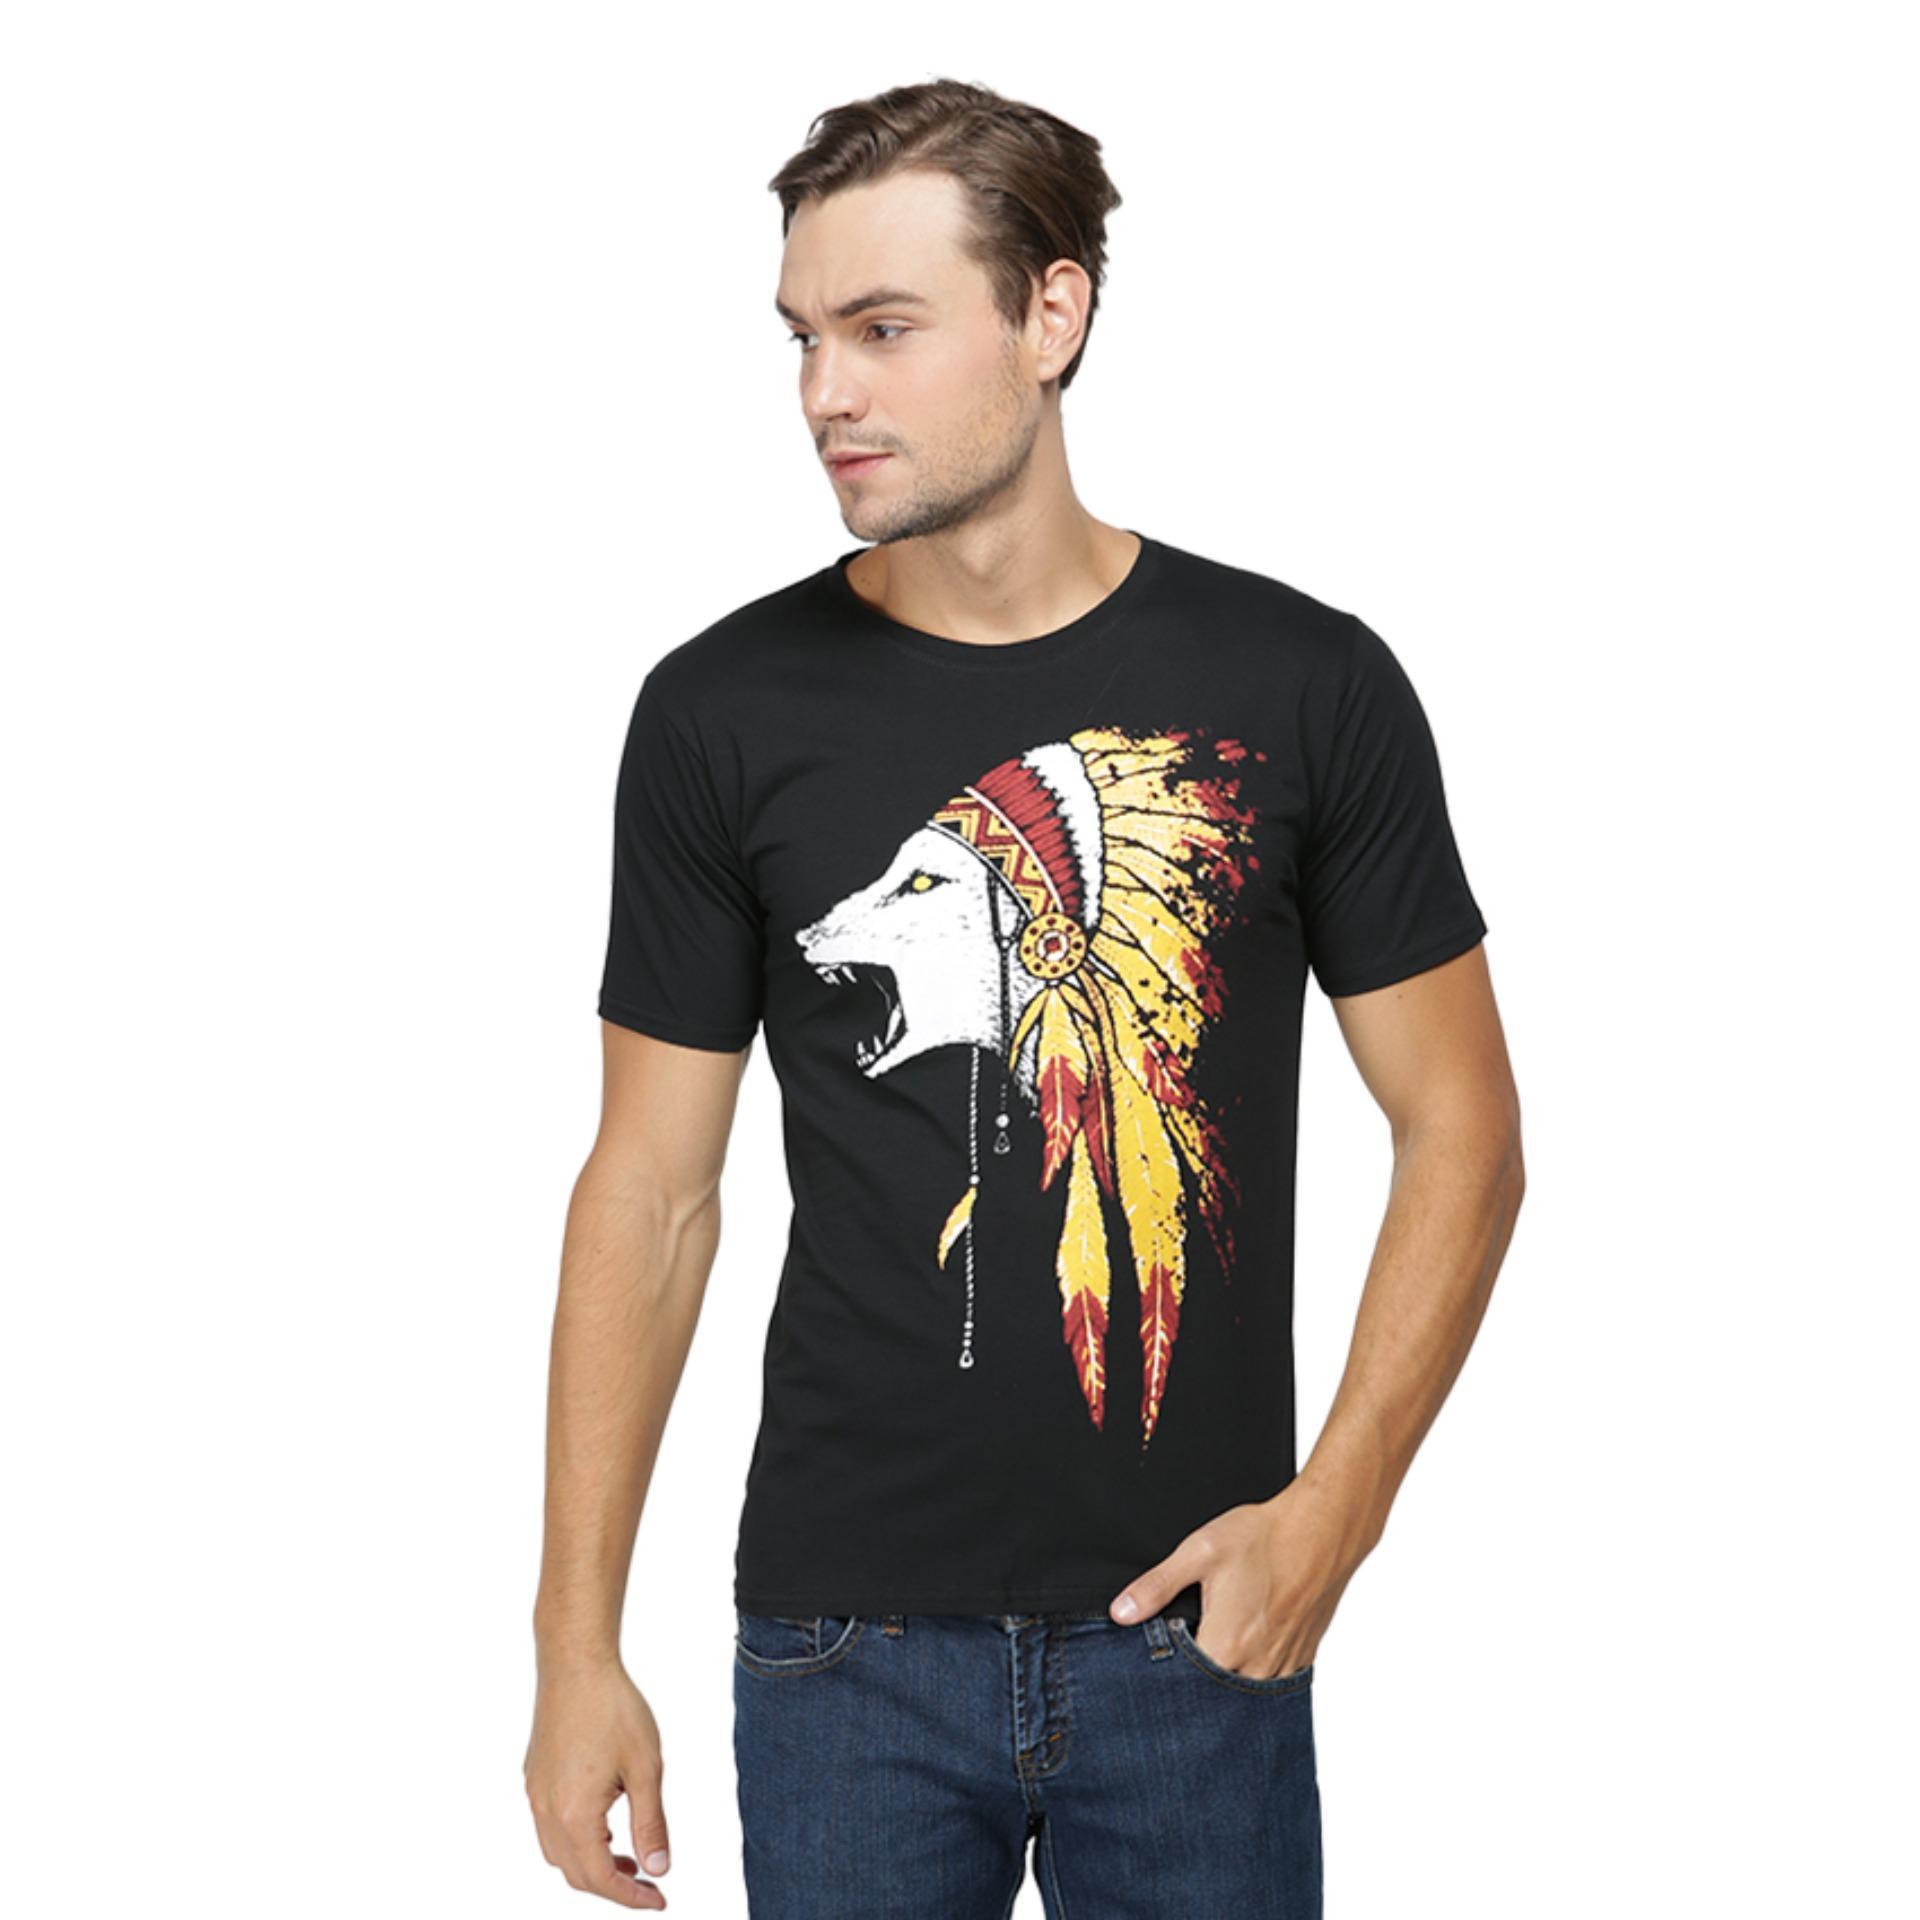 Buy Sell Cheapest Premium Indian Ear Best Quality Product Deals Ekstrak Daun Ketapang Merah 100ml Almond Vanwin Kaos T Shirt Distro Pria Tshirt